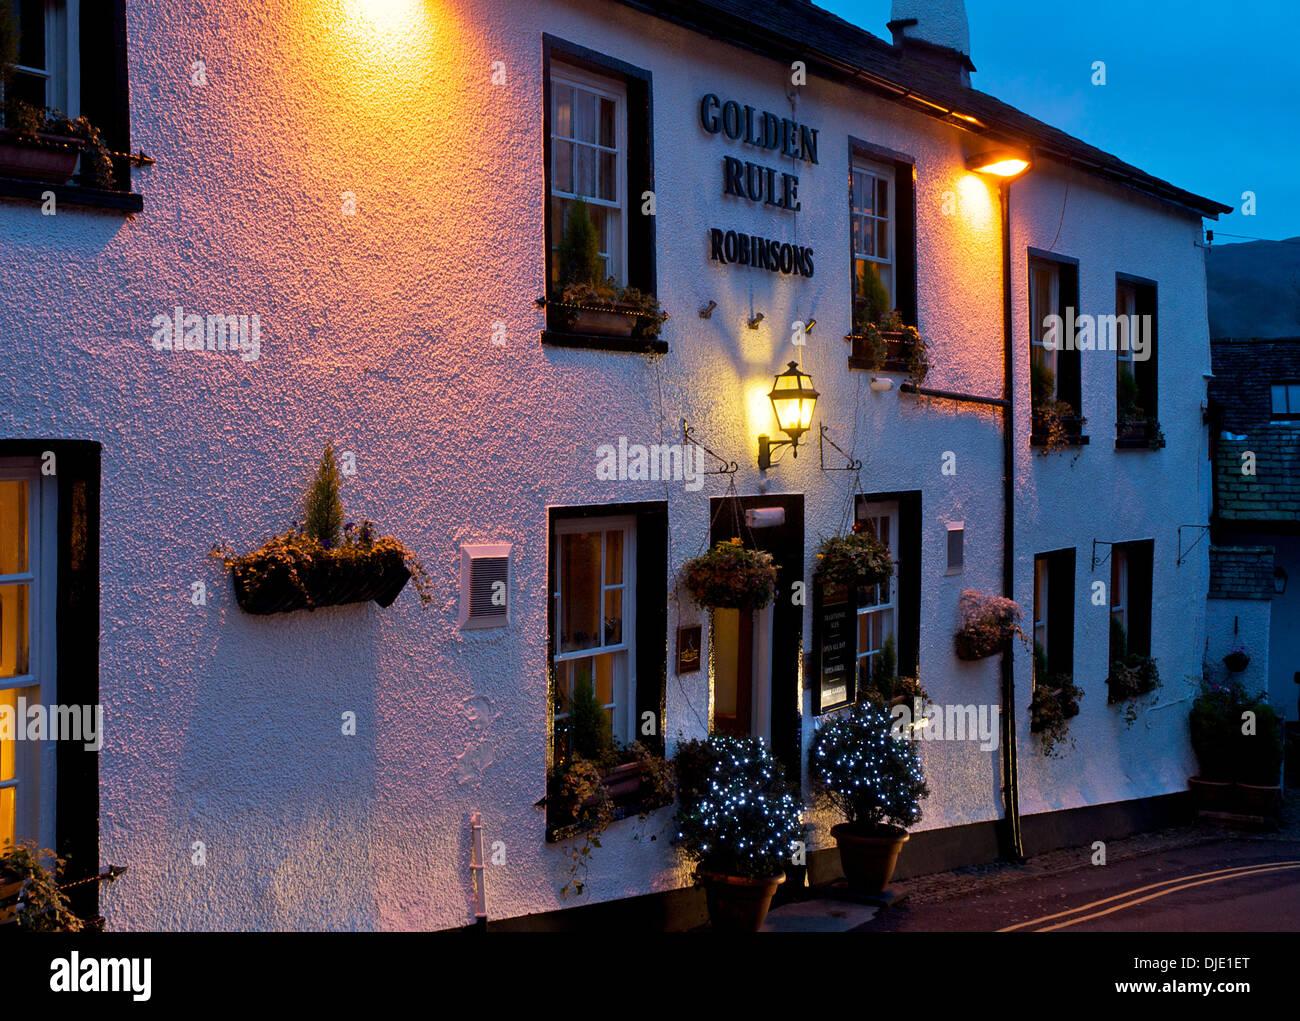 The Golden Rule pub, at dusk, Ambleside, Lake District National Park, Cumbria, England UK - Stock Image